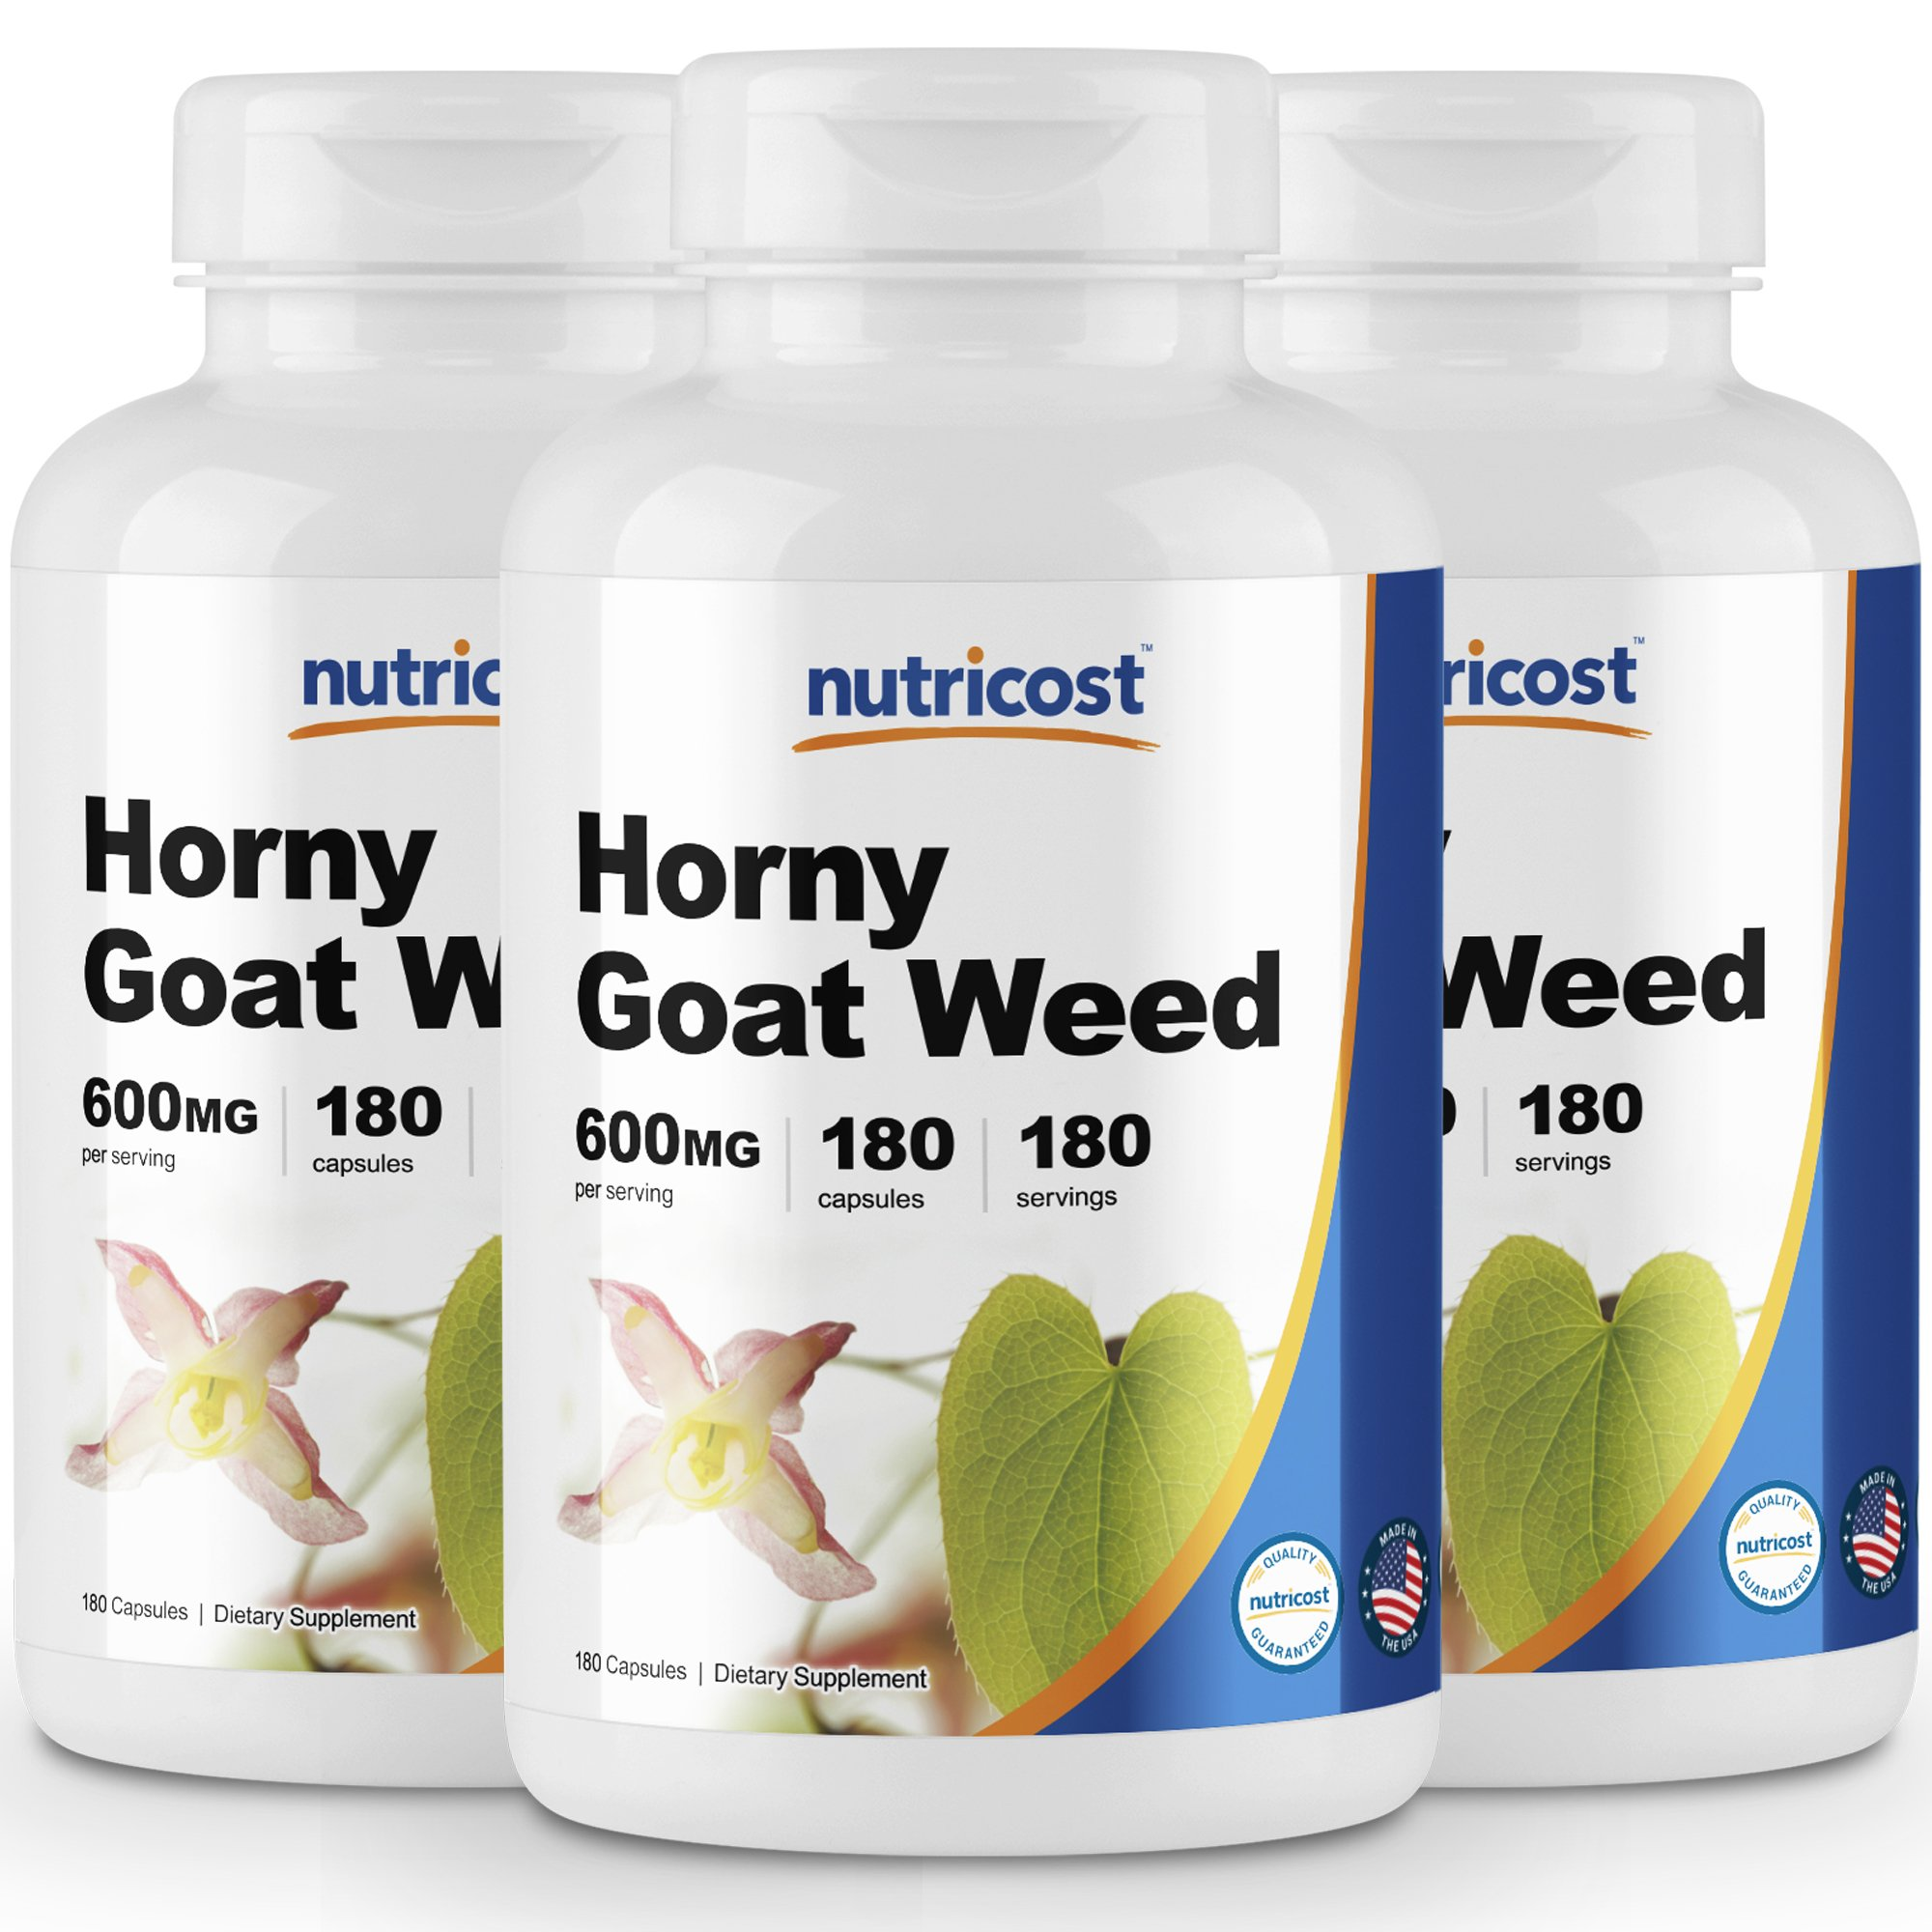 Nutricost Horny Goat Weed Extract (Epimedium) (3 Bottles) - 180 Capsules, 180 Servings Per Bottle; 600mg Per Capsule